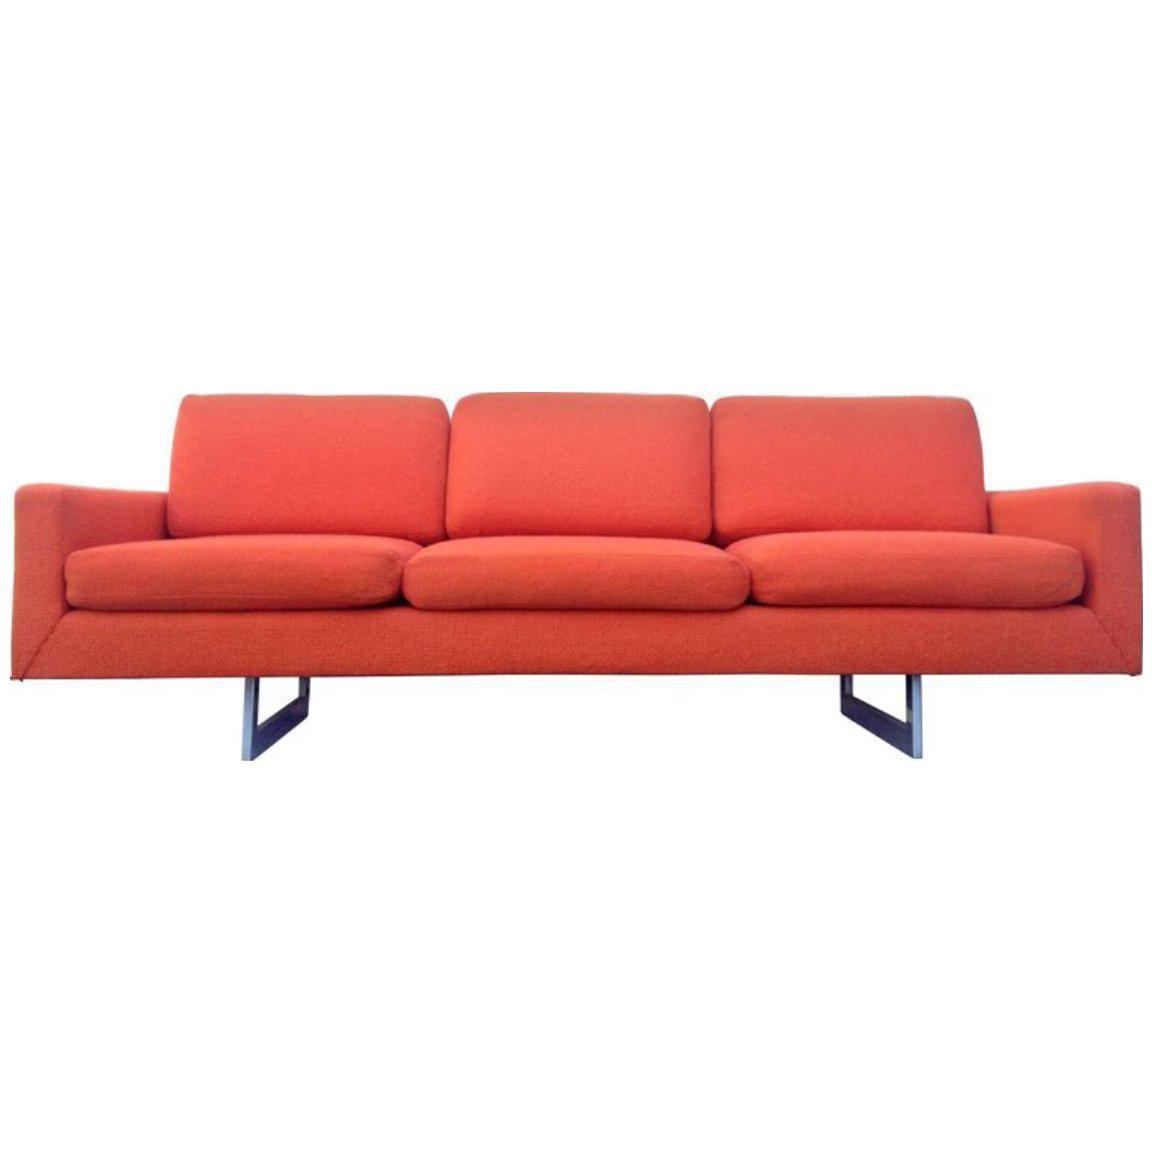 Bright Orange Architectural Mid Century Modern Sofa